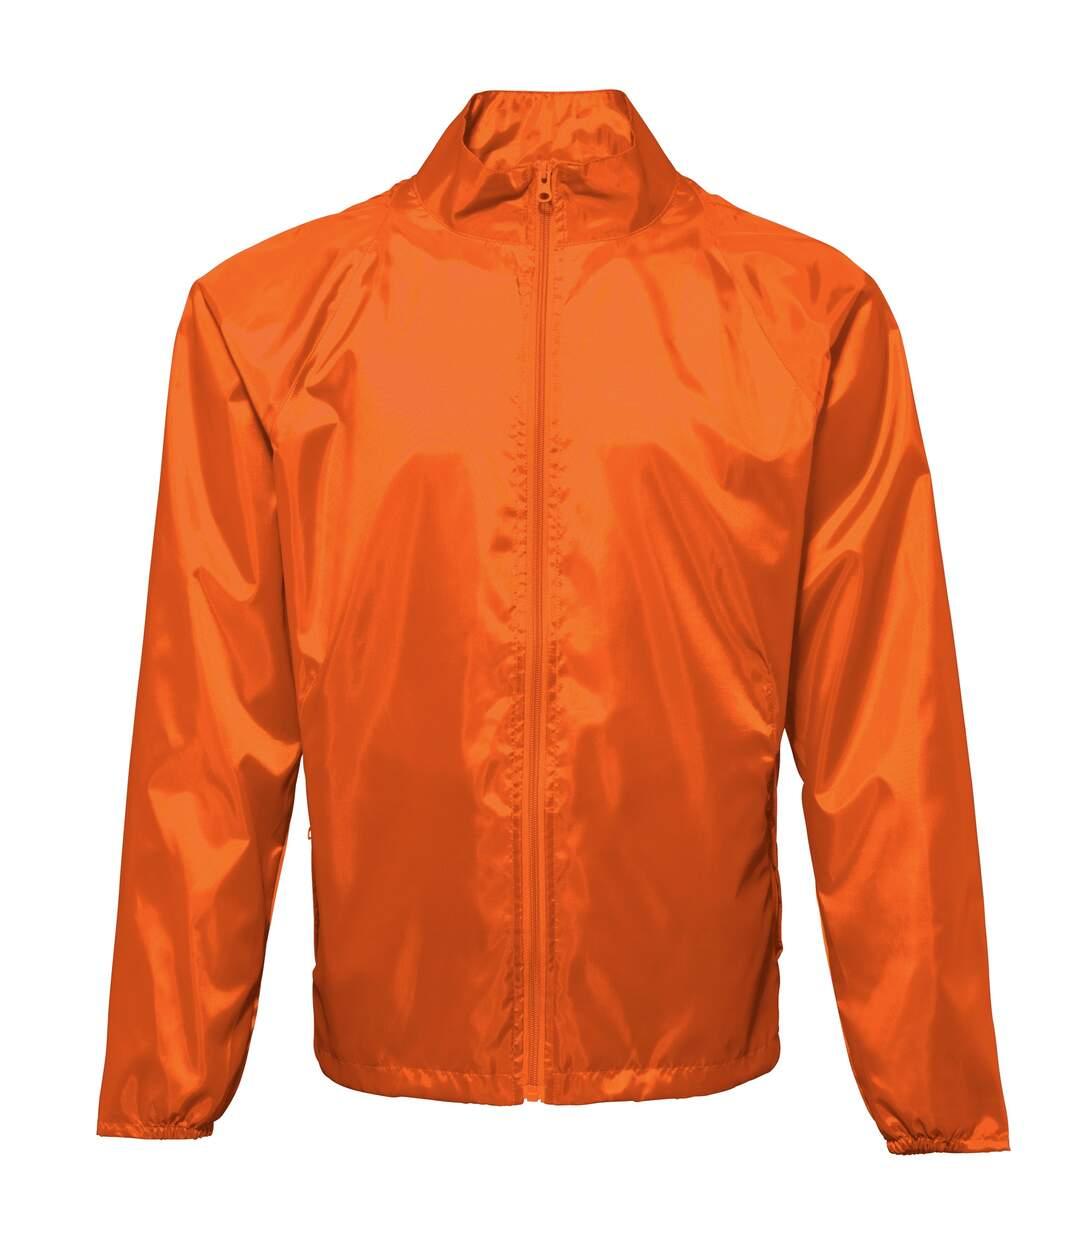 2786 Unisex Lightweight Plain Wind & Shower Resistant Jacket (Orange) - UTRW2500